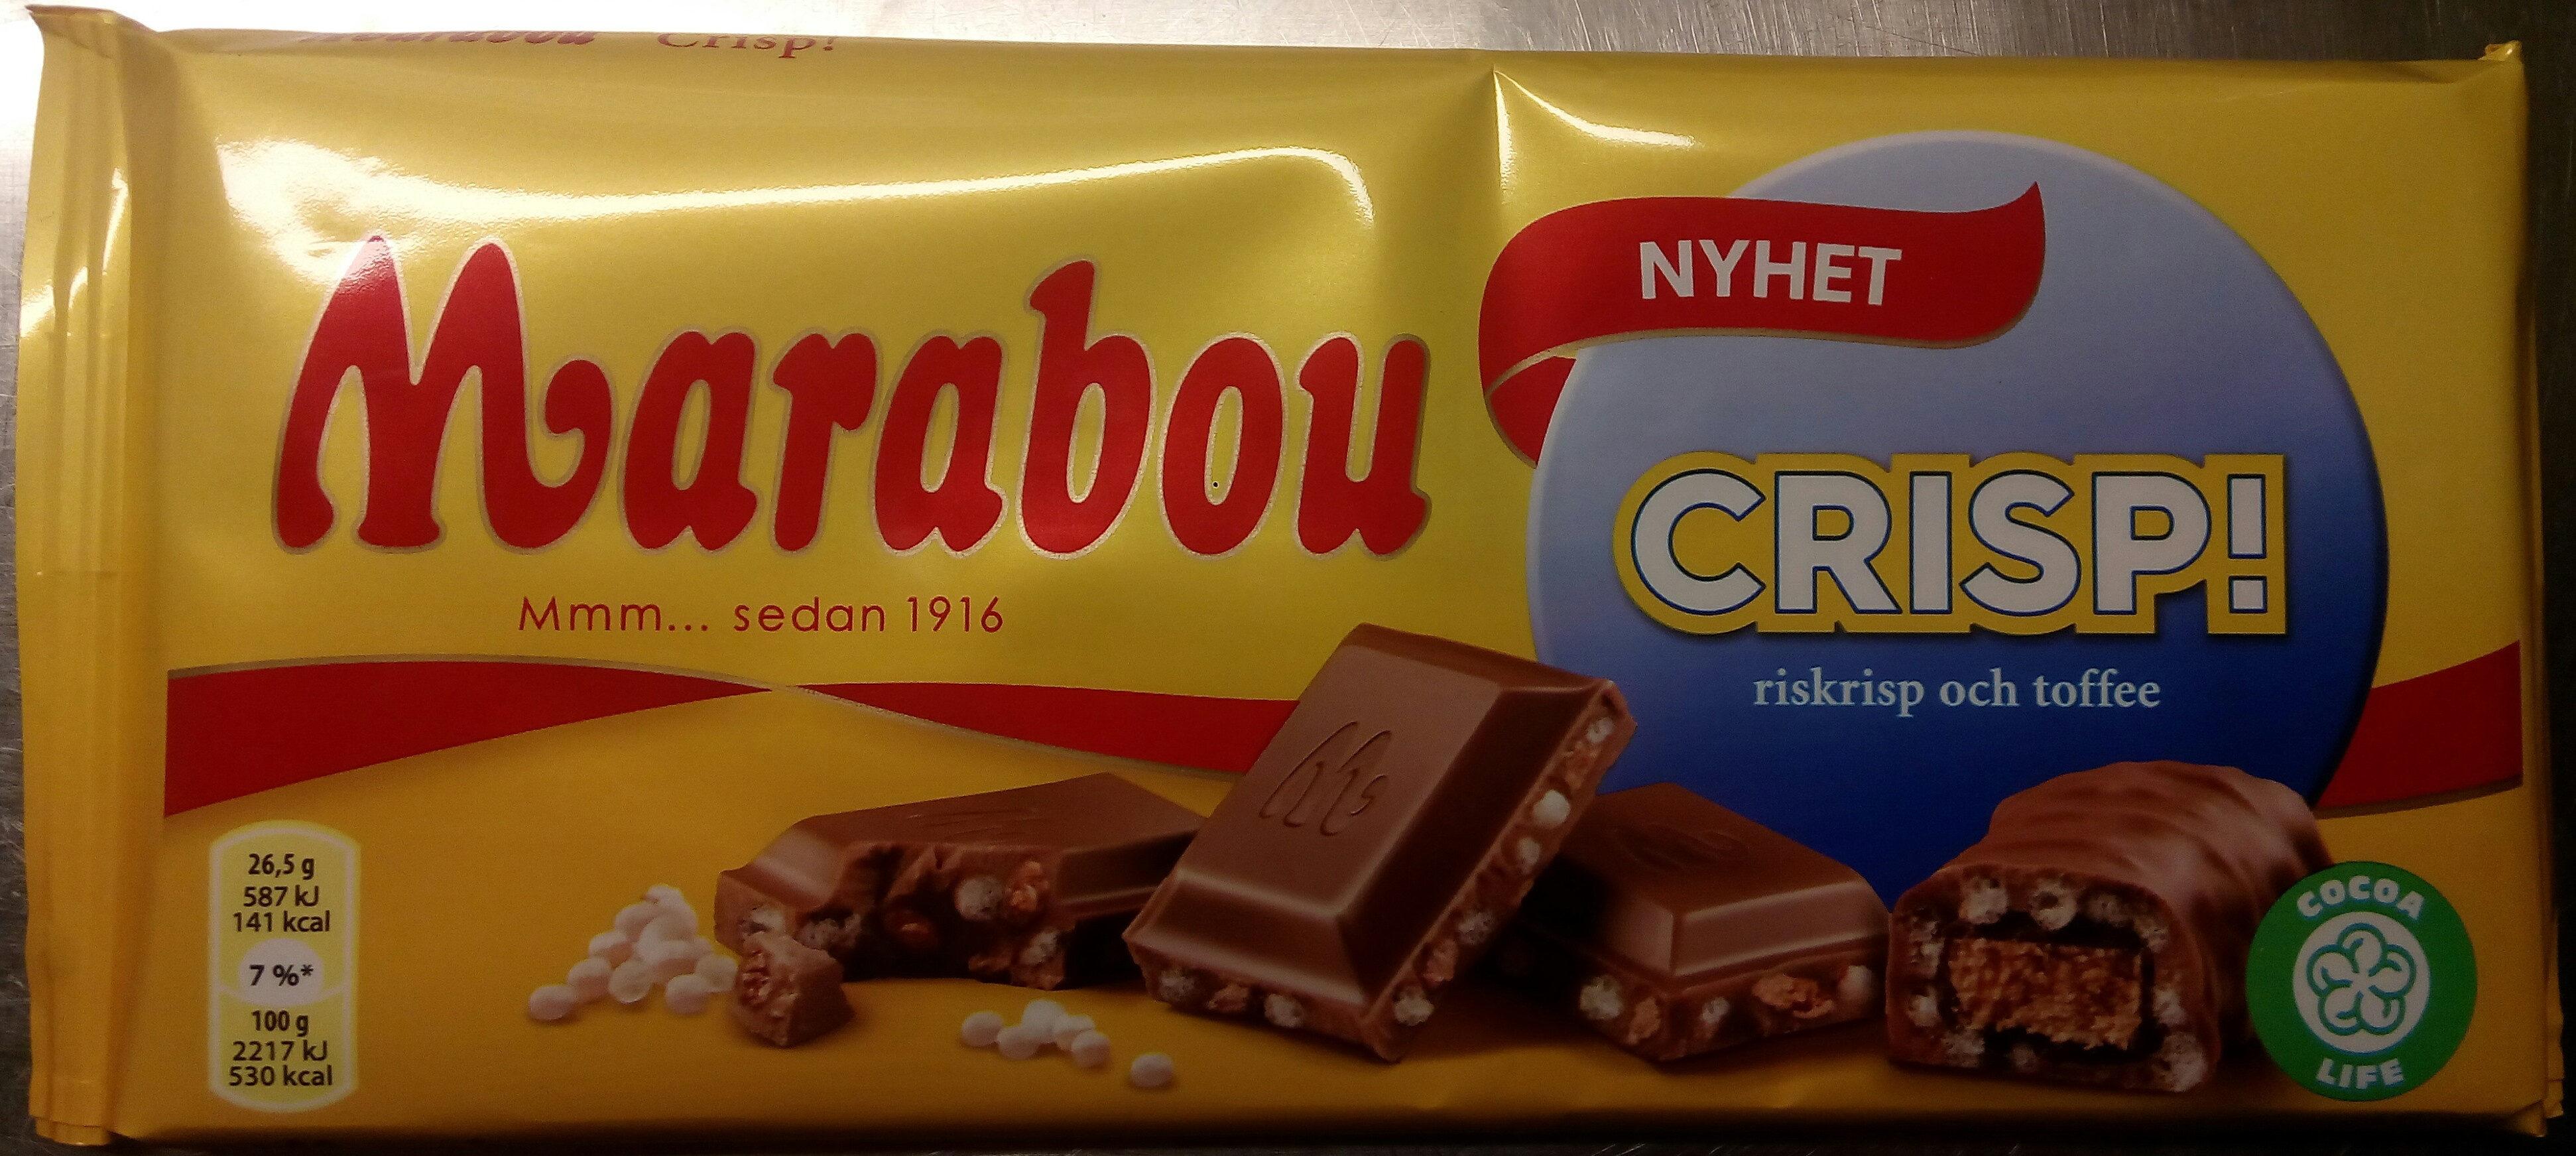 marabou crisp nyhet